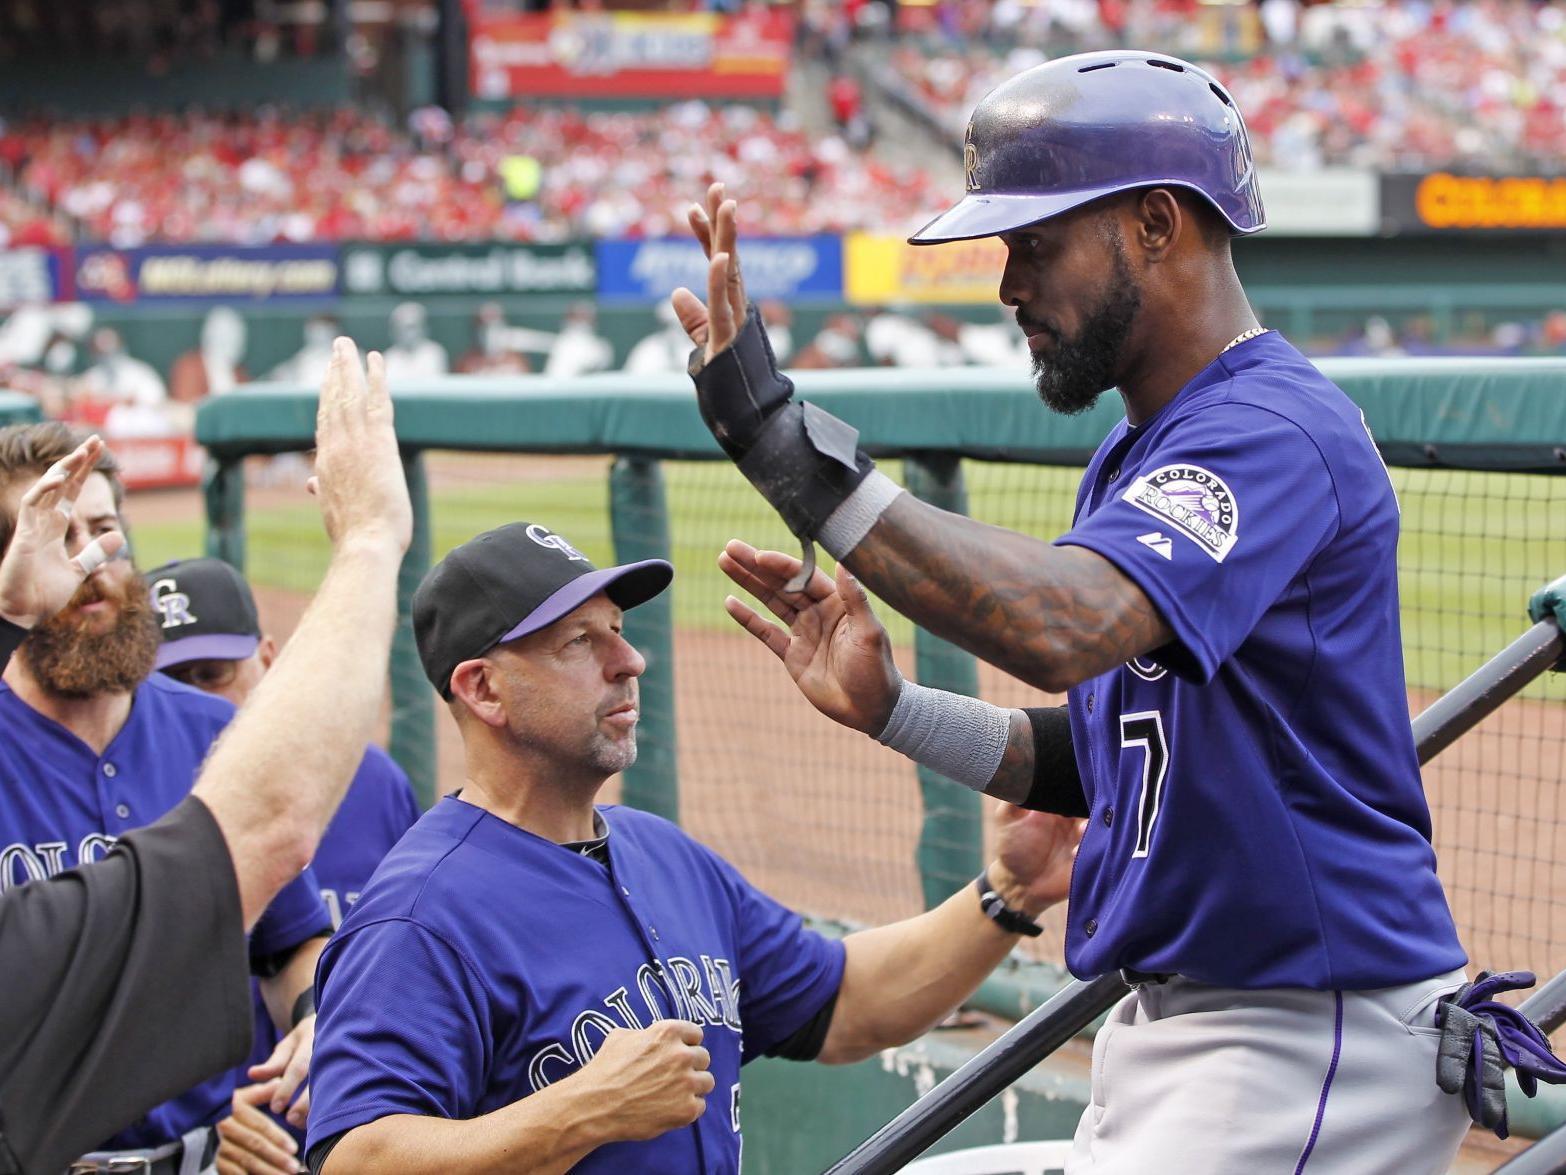 MLB notes: Rockies' Reyes suspended through May 31 | Baseball | stltoday.com